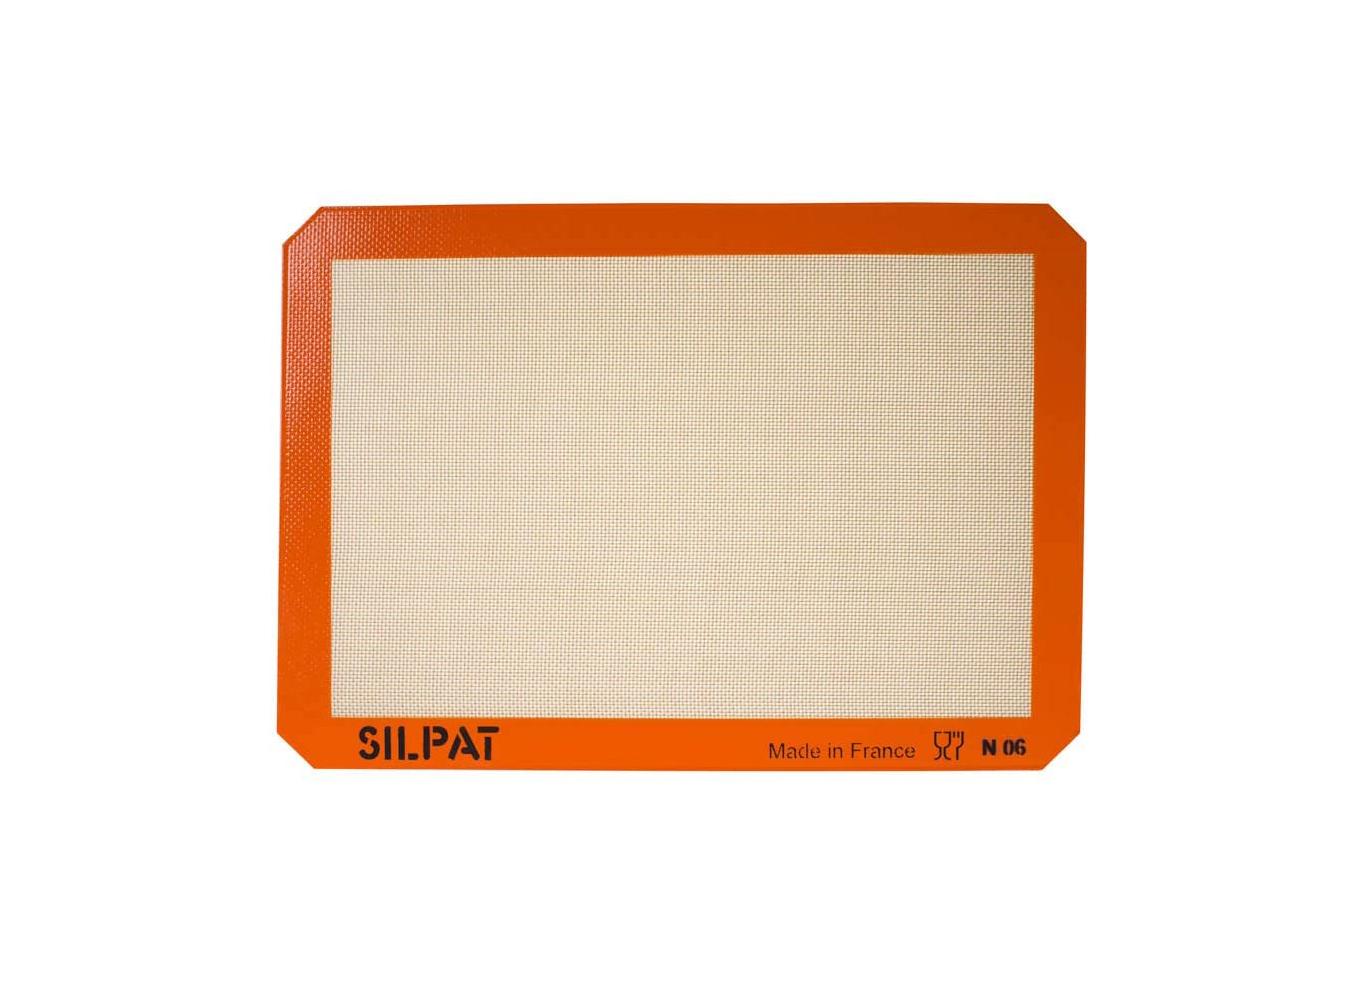 Silpat Premium Non-Stick Silicone Baking Mat